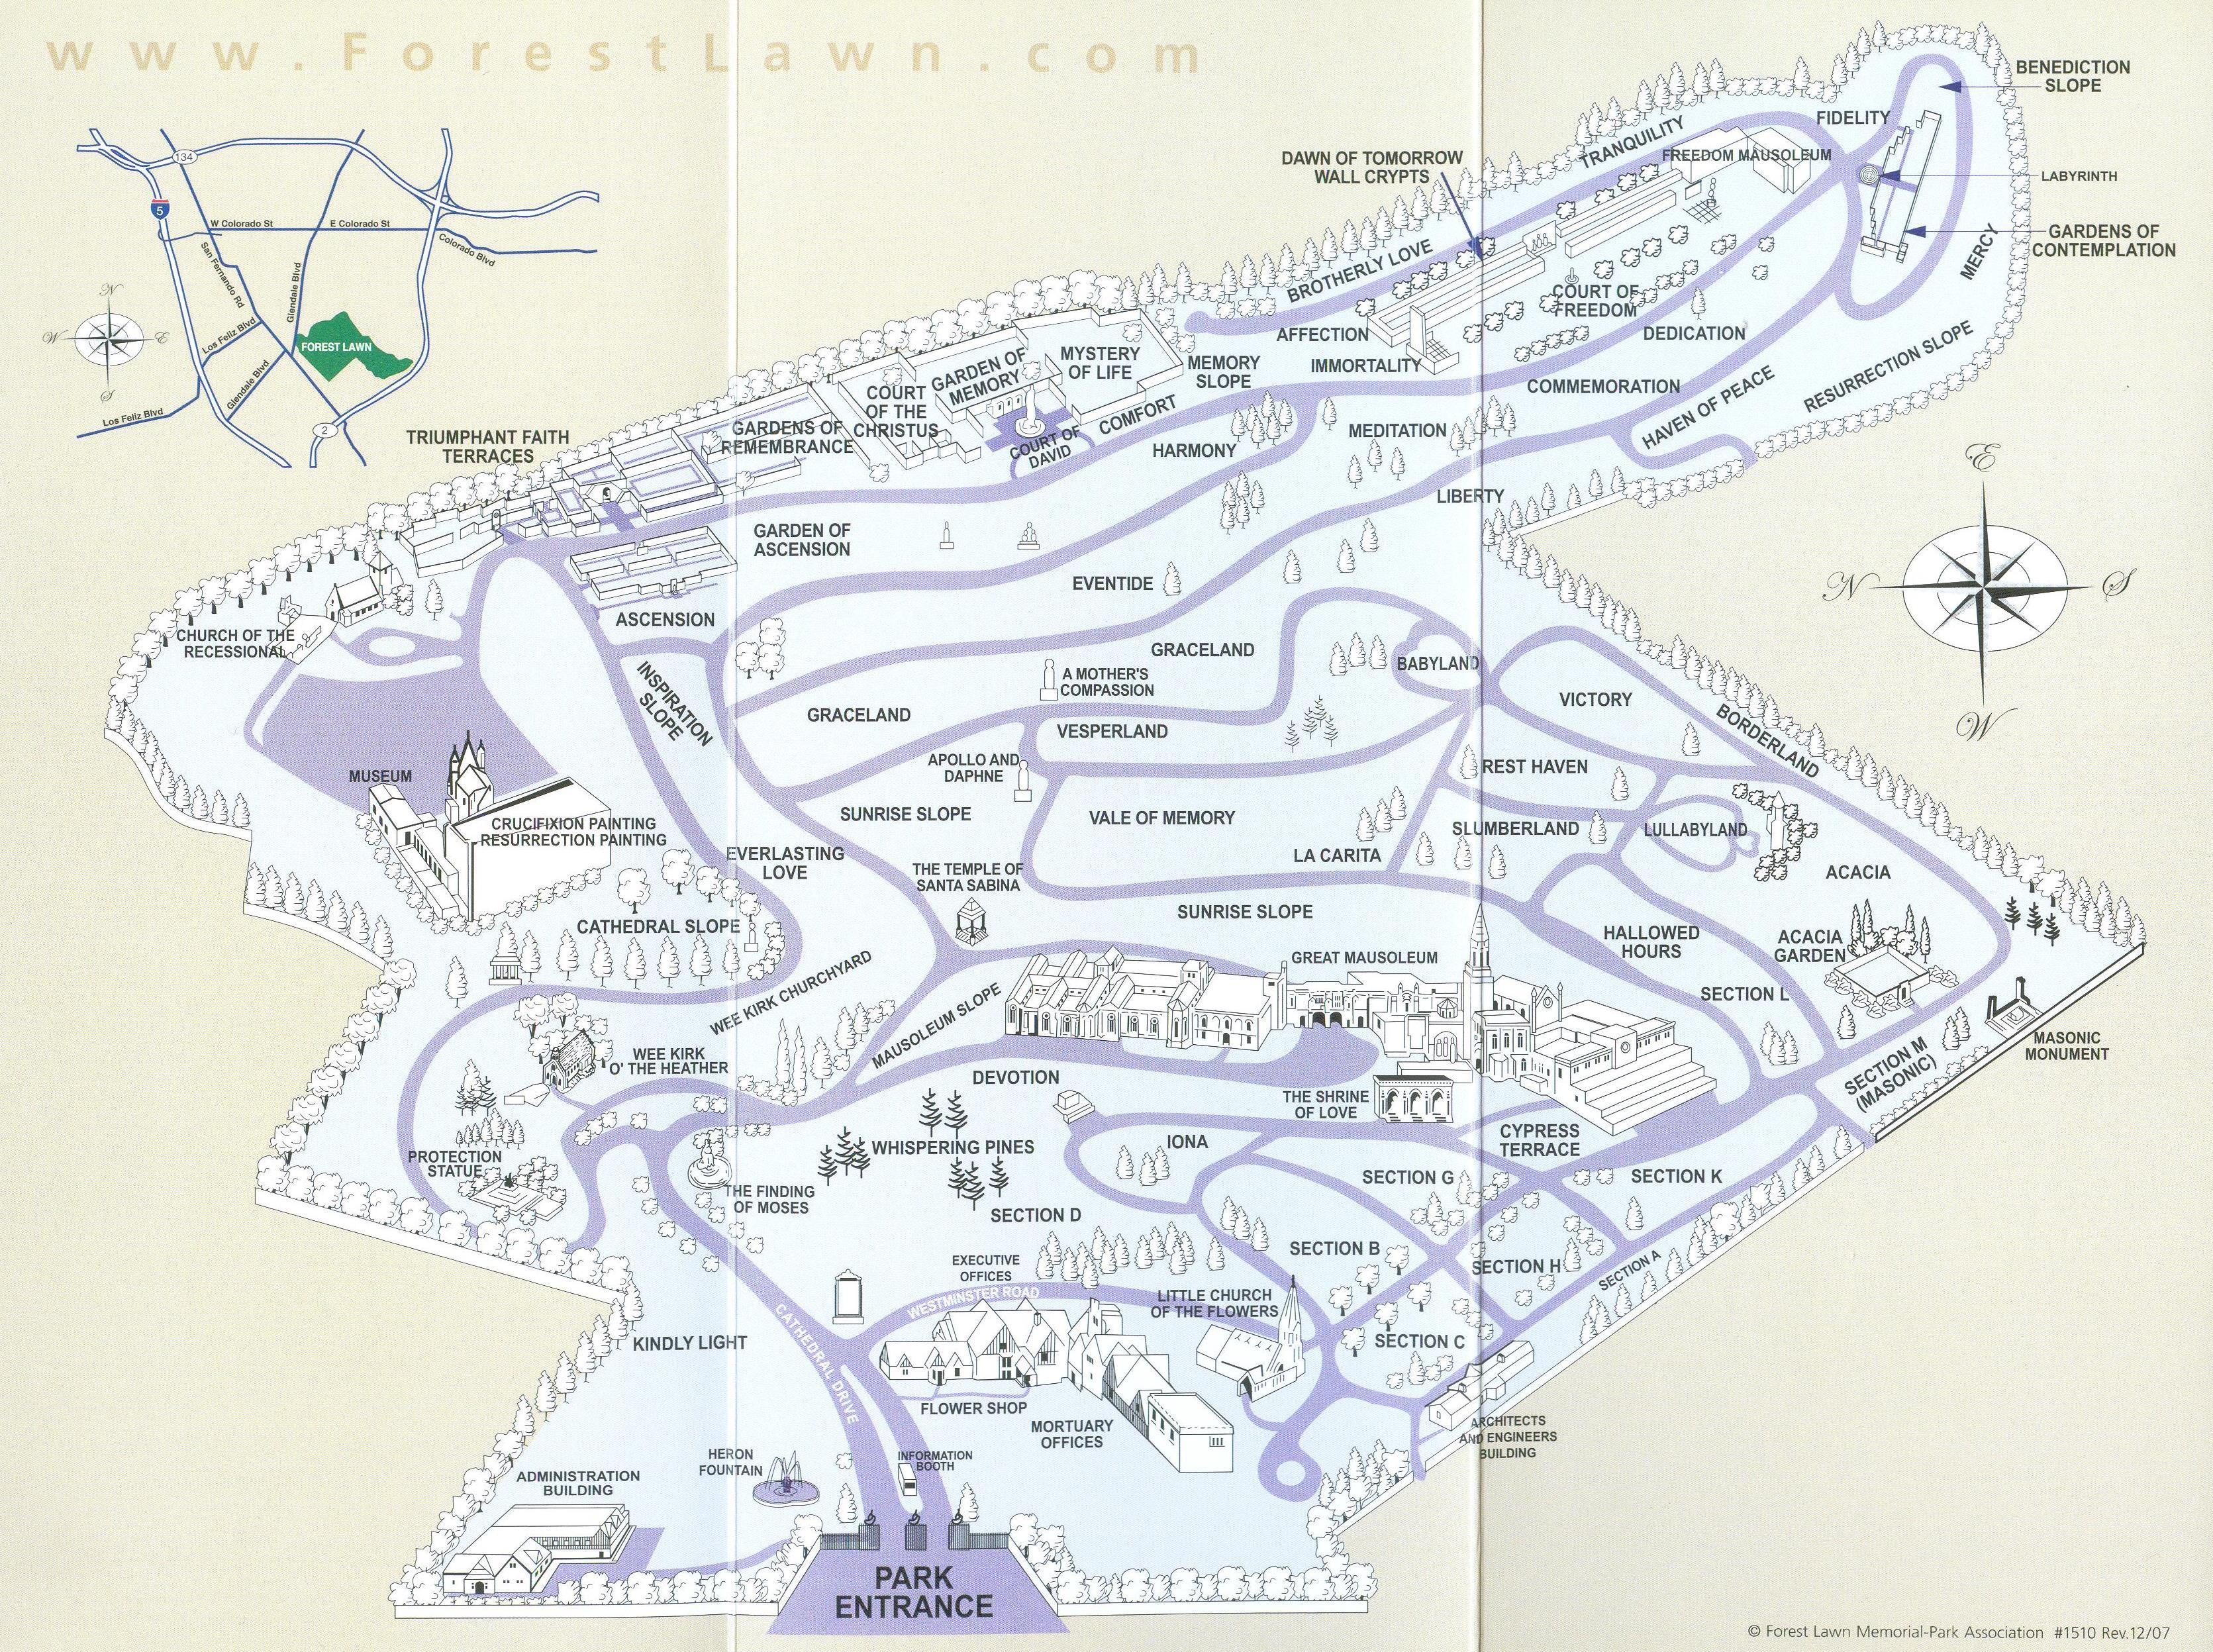 Cemetery Maps